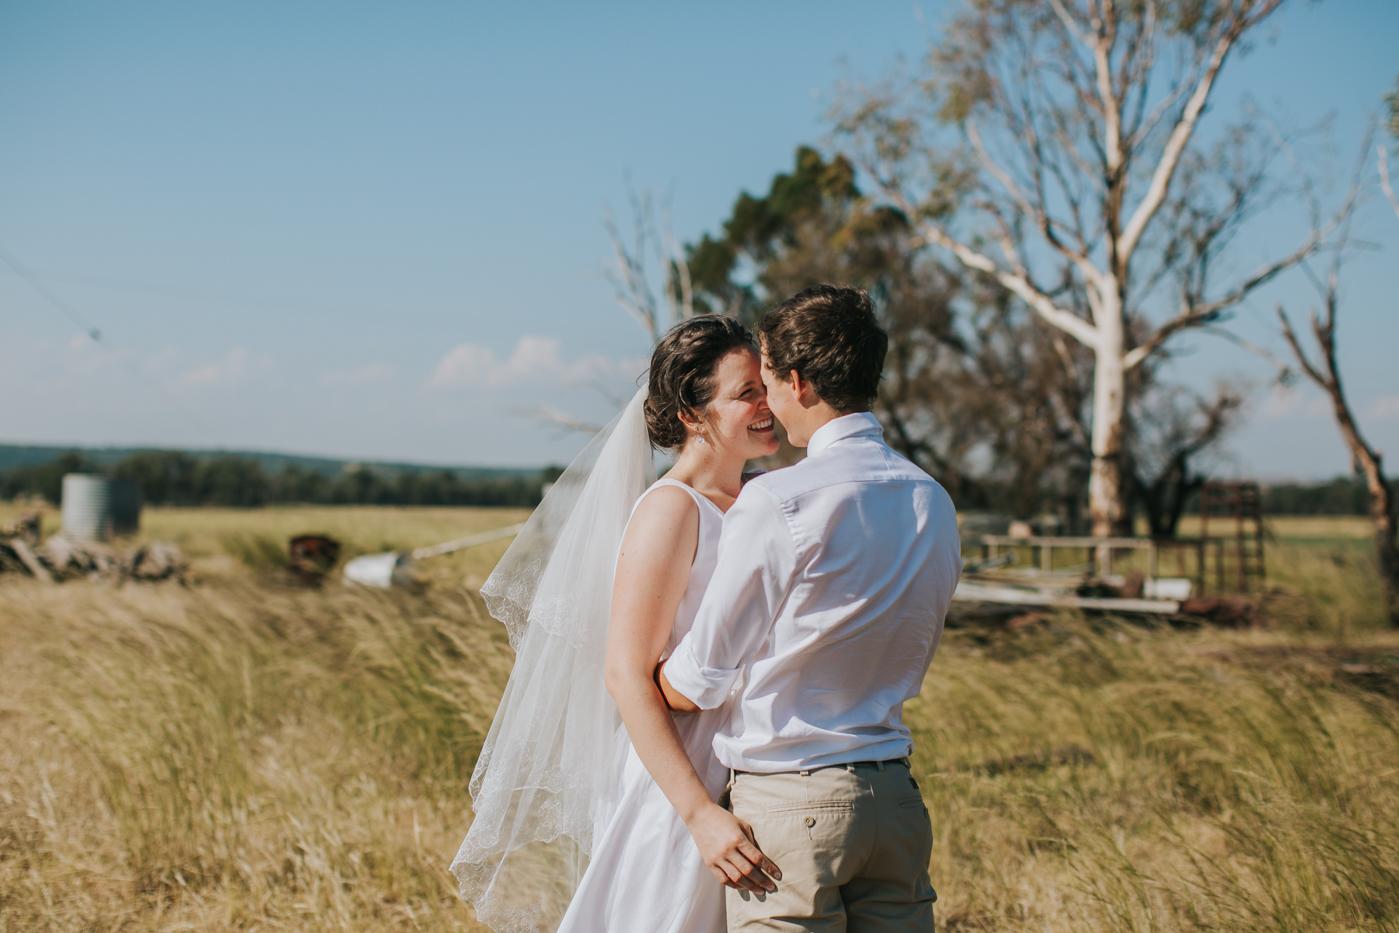 Nicolle & Jacob - Dubbo Wedding - Country Australia - Samantha Heather Photography-162.jpg